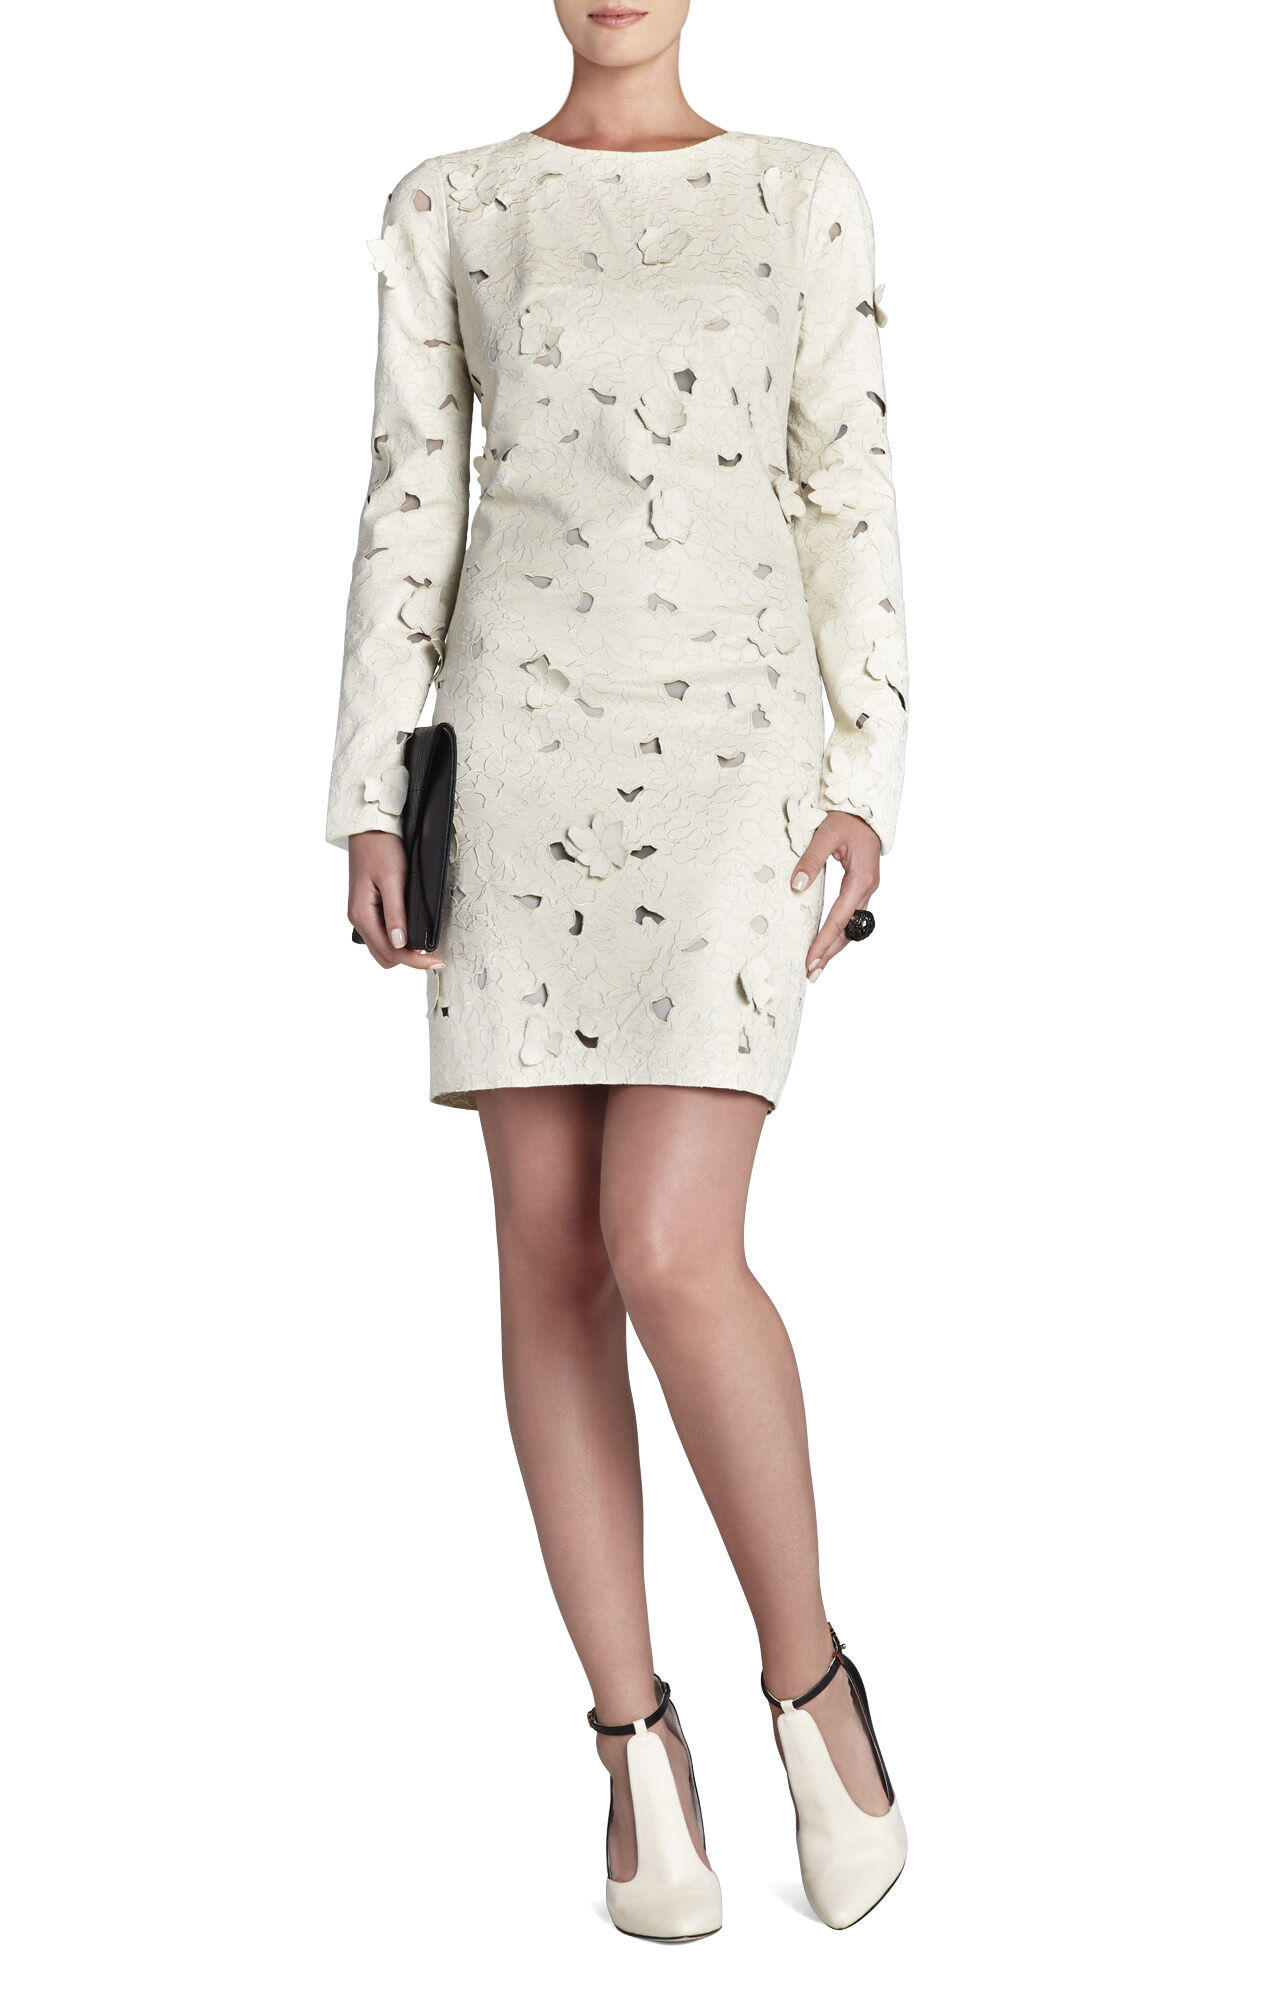 Jillea Embroidered Cutout Faux-Leather Dress